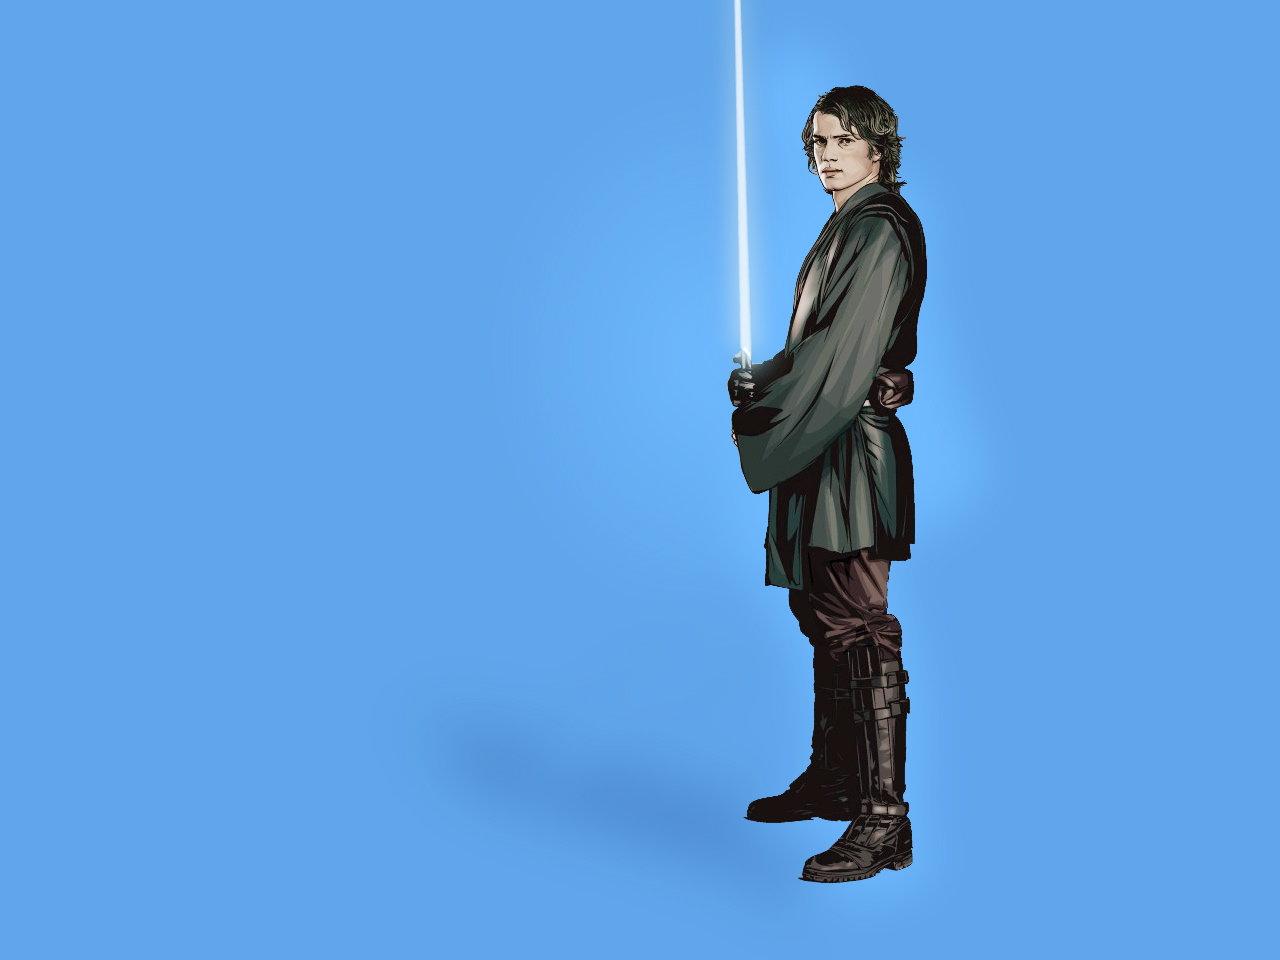 Anakin Skywalker Wallpaper by auctoris 1280x960